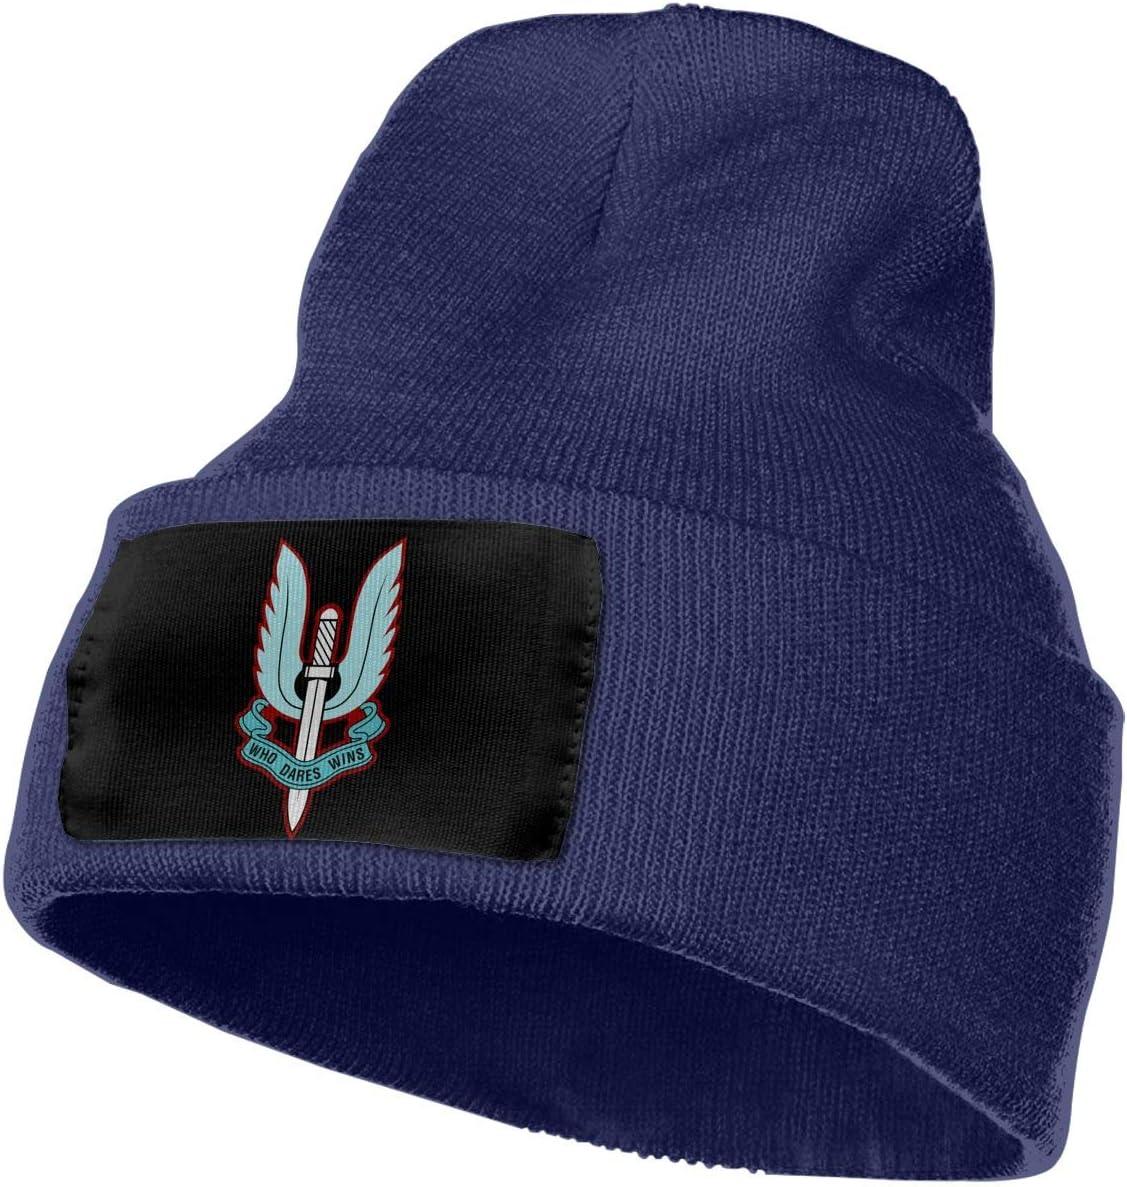 Special Air Service1 Men/&Women Warm Winter Knit Plain Beanie Hat Skull Cap Acrylic Knit Cuff Hat